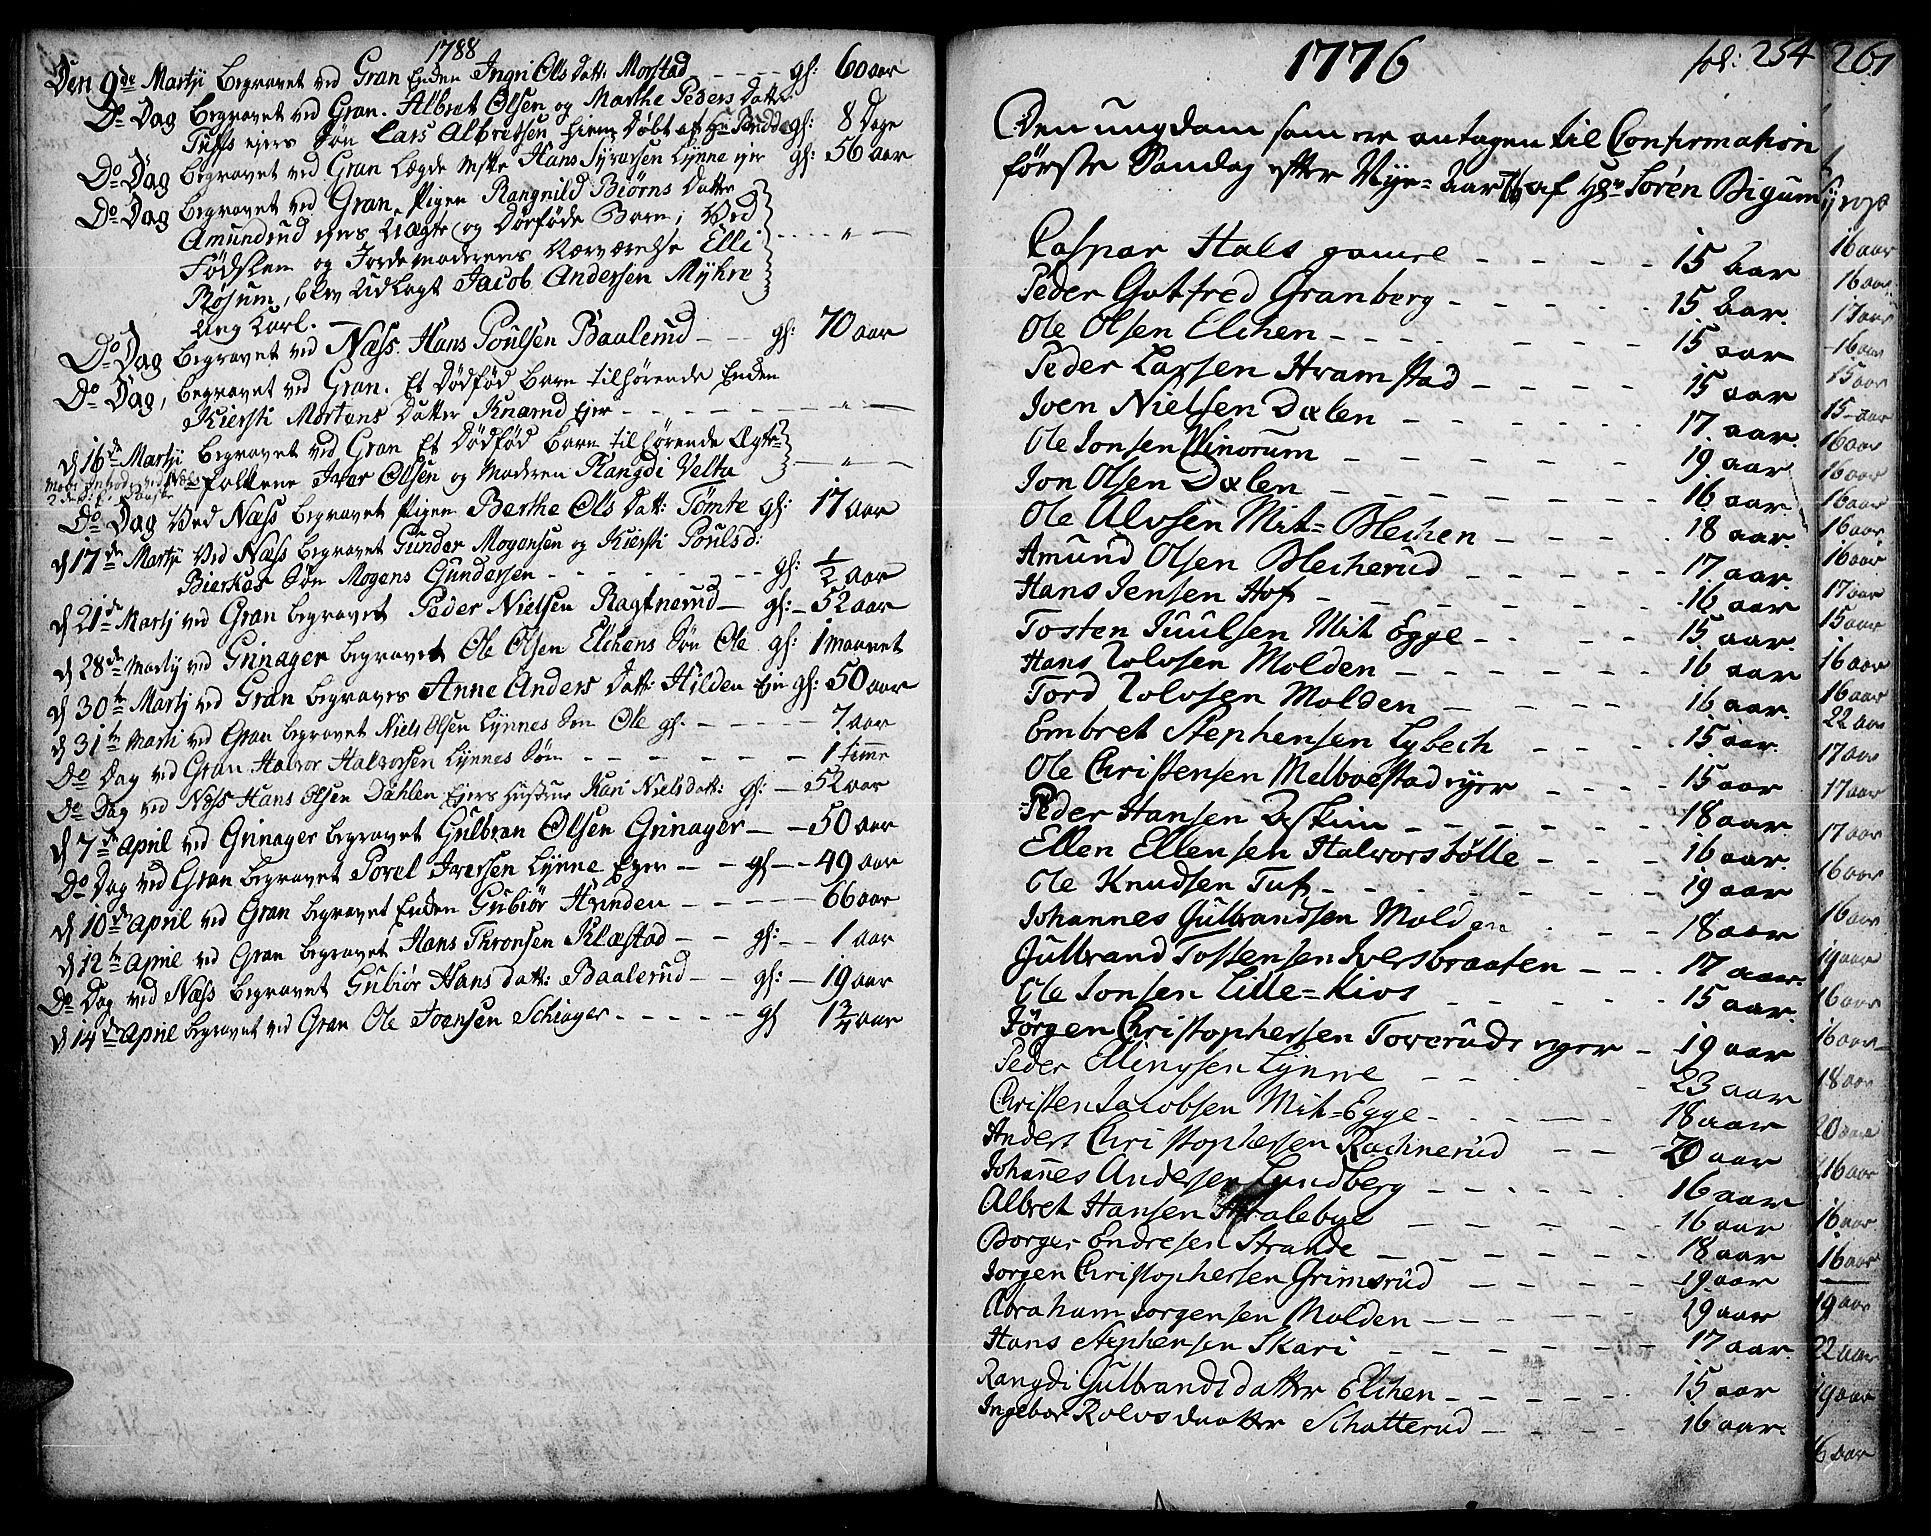 SAH, Gran prestekontor, Ministerialbok nr. 5, 1776-1788, s. 254